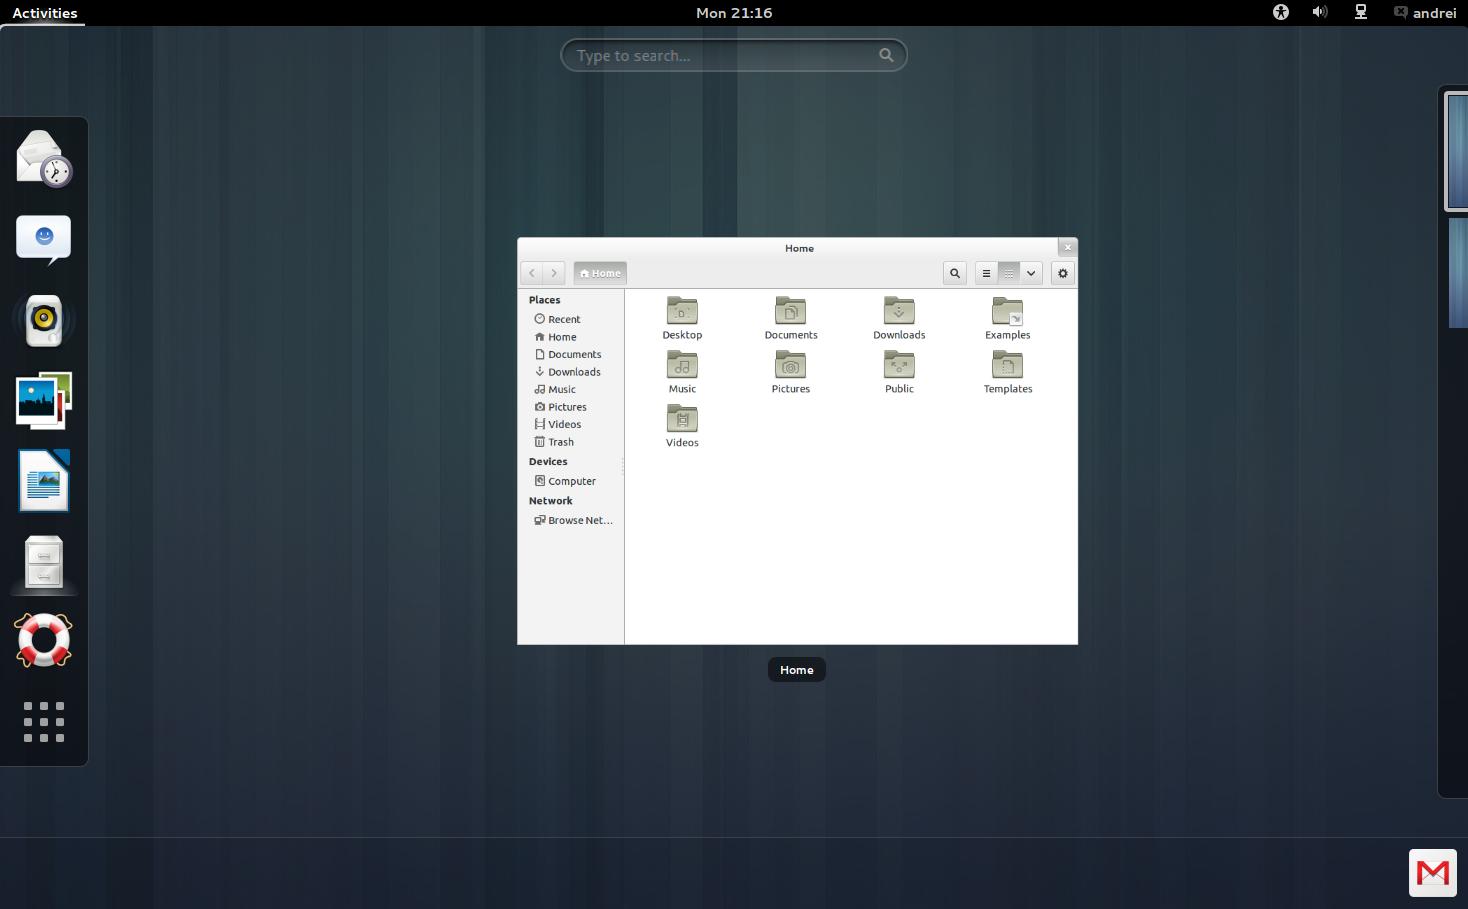 How To Get A Complete GNOME 3 Desktop In Ubuntu 12.10 ... Ubuntu Gnome Desktop